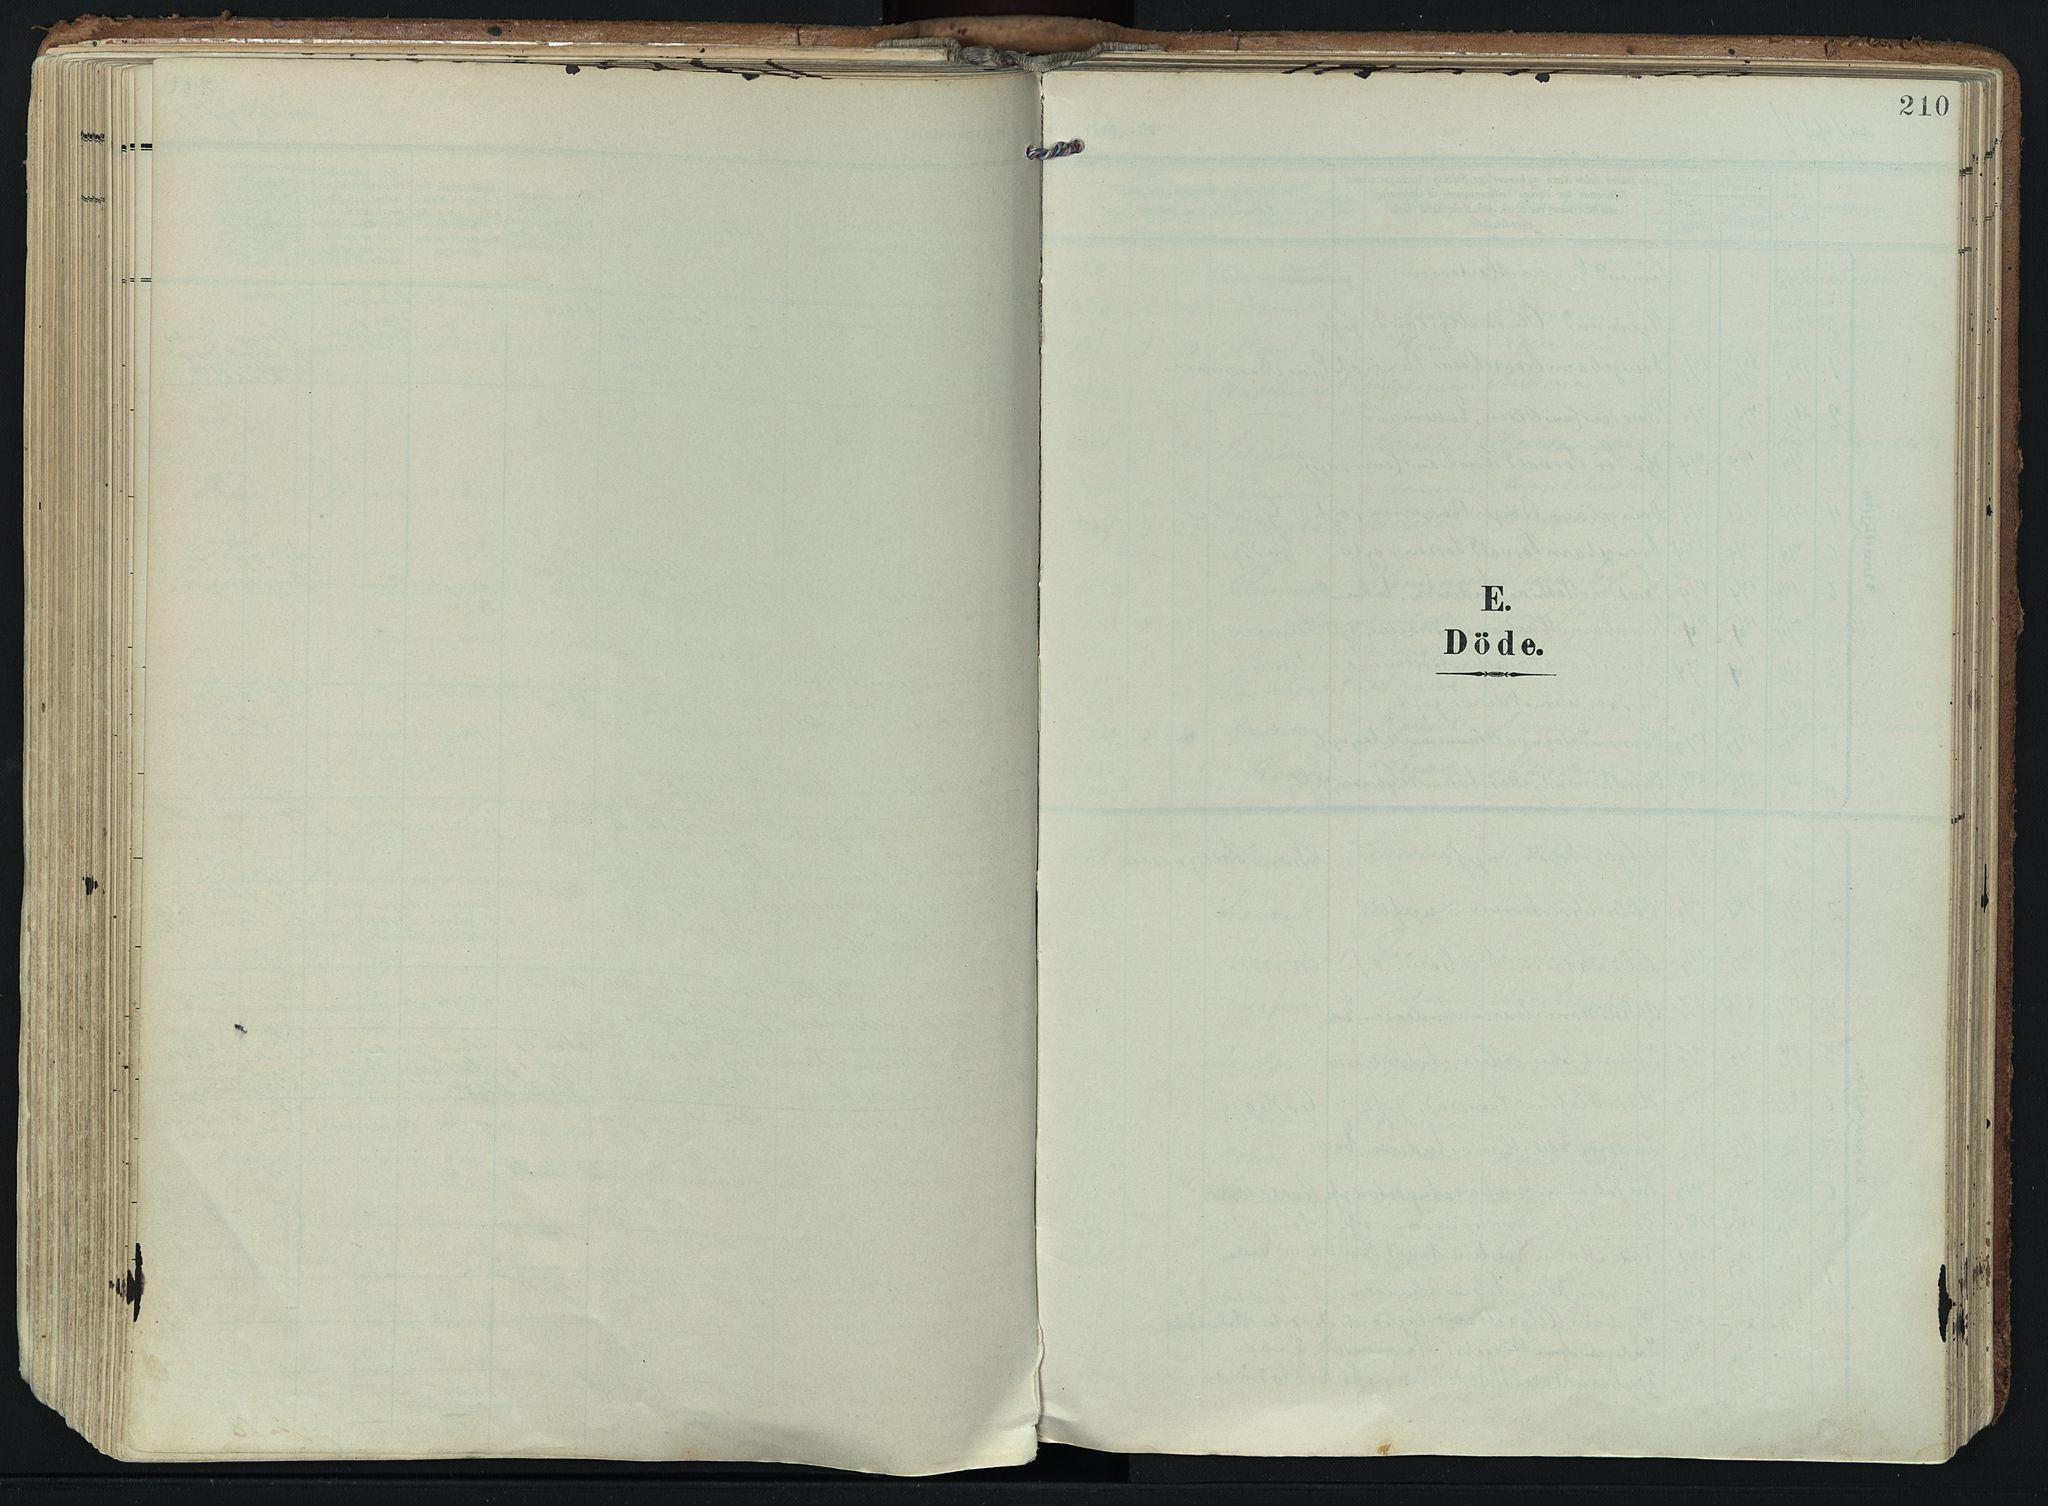 SAKO, Hedrum kirkebøker, F/Fa/L0010: Ministerialbok nr. I 10, 1904-1918, s. 210